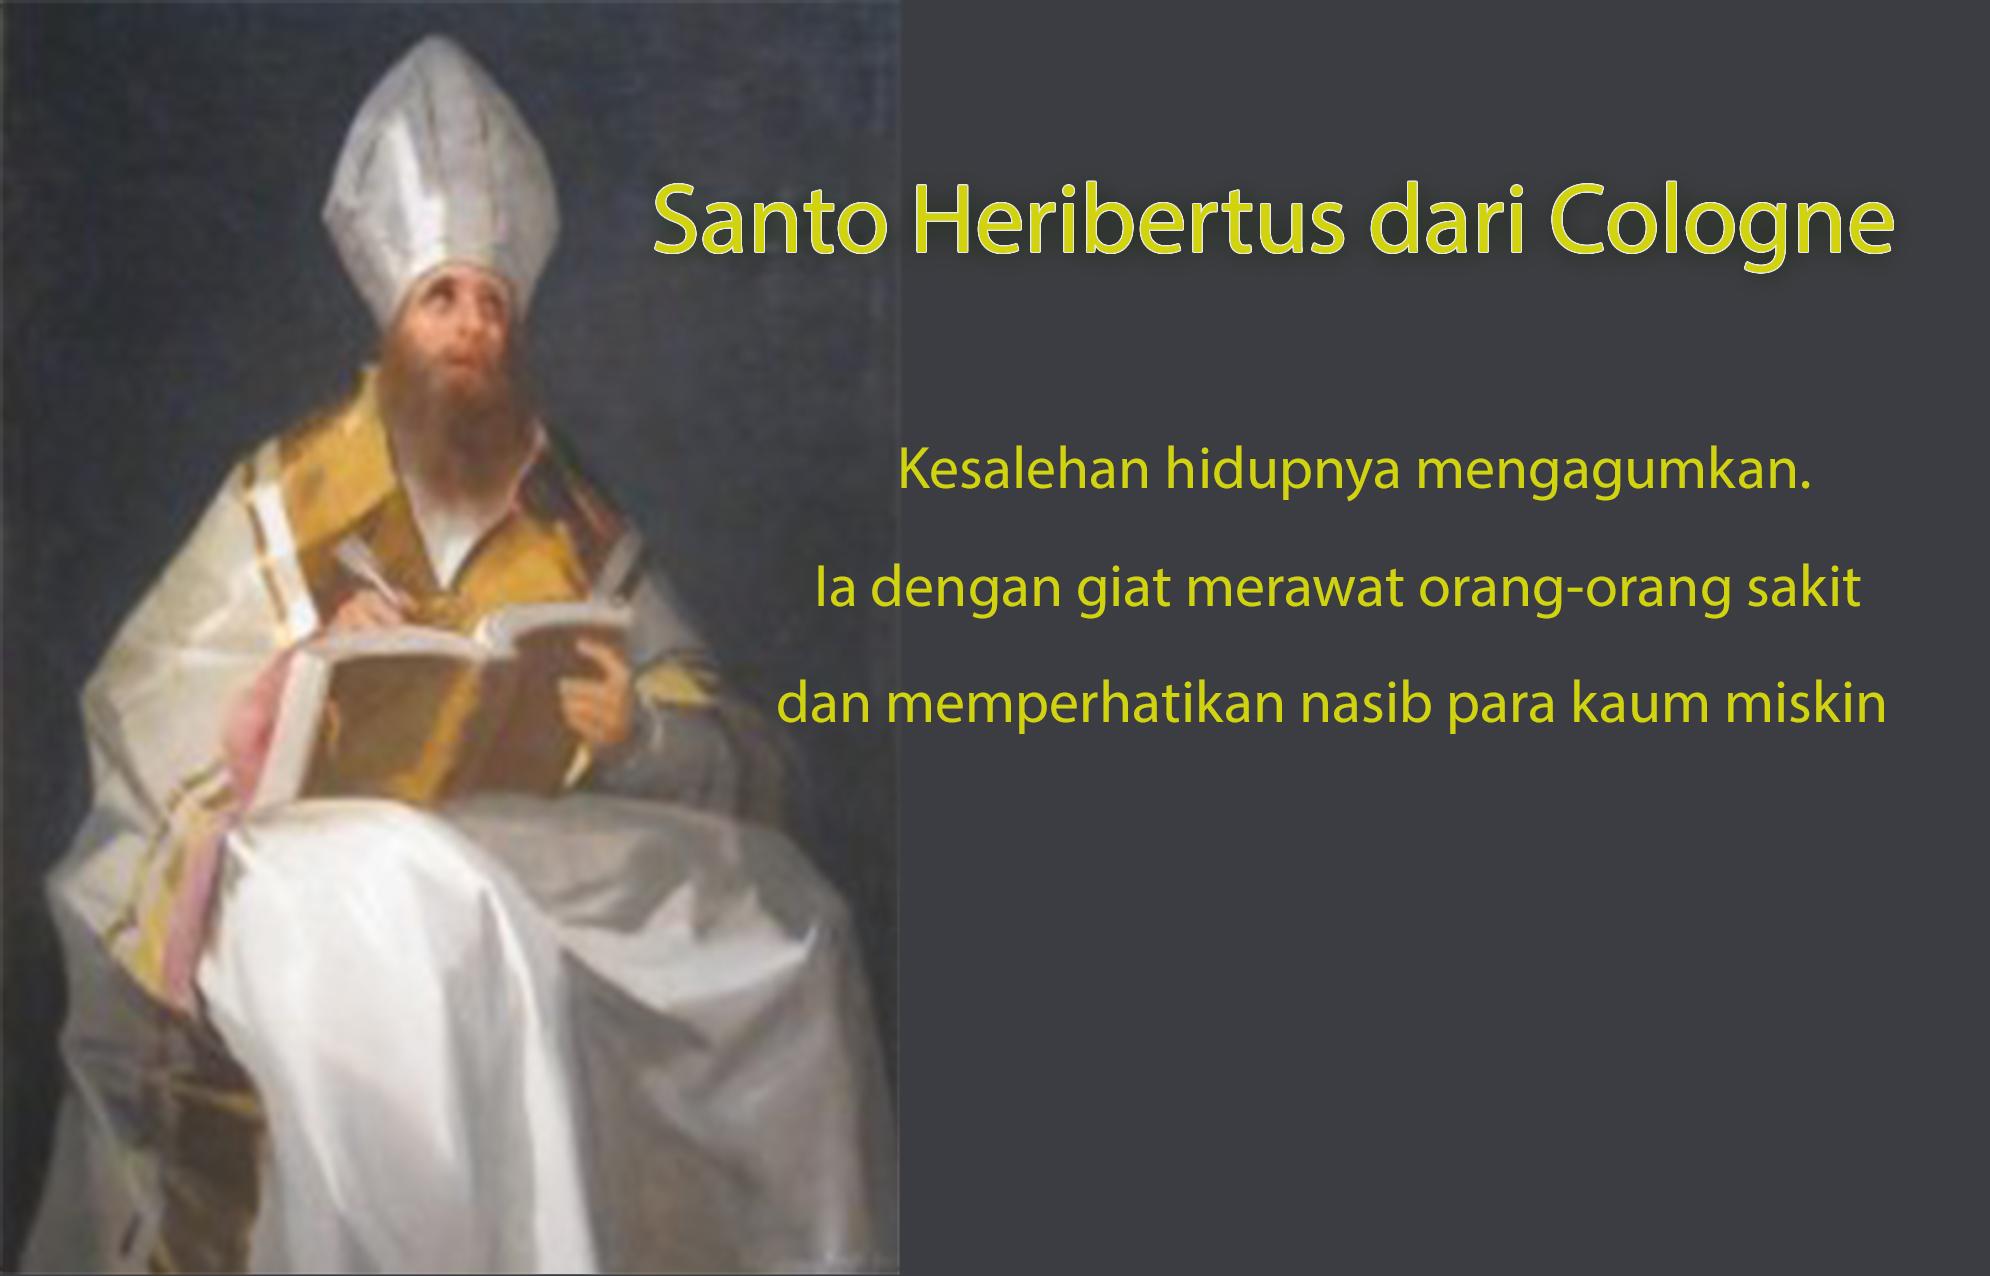 16 Maret, katekese, katolik, Komsos KWI, Konferensi Waligereja Indonesia, KWI, Para Kudus di Surga, putera allah, Santo Heribertus dari Cologne, Santa Matilda, Santa Eufrasia, santo santa, Sukacita, teladan kita